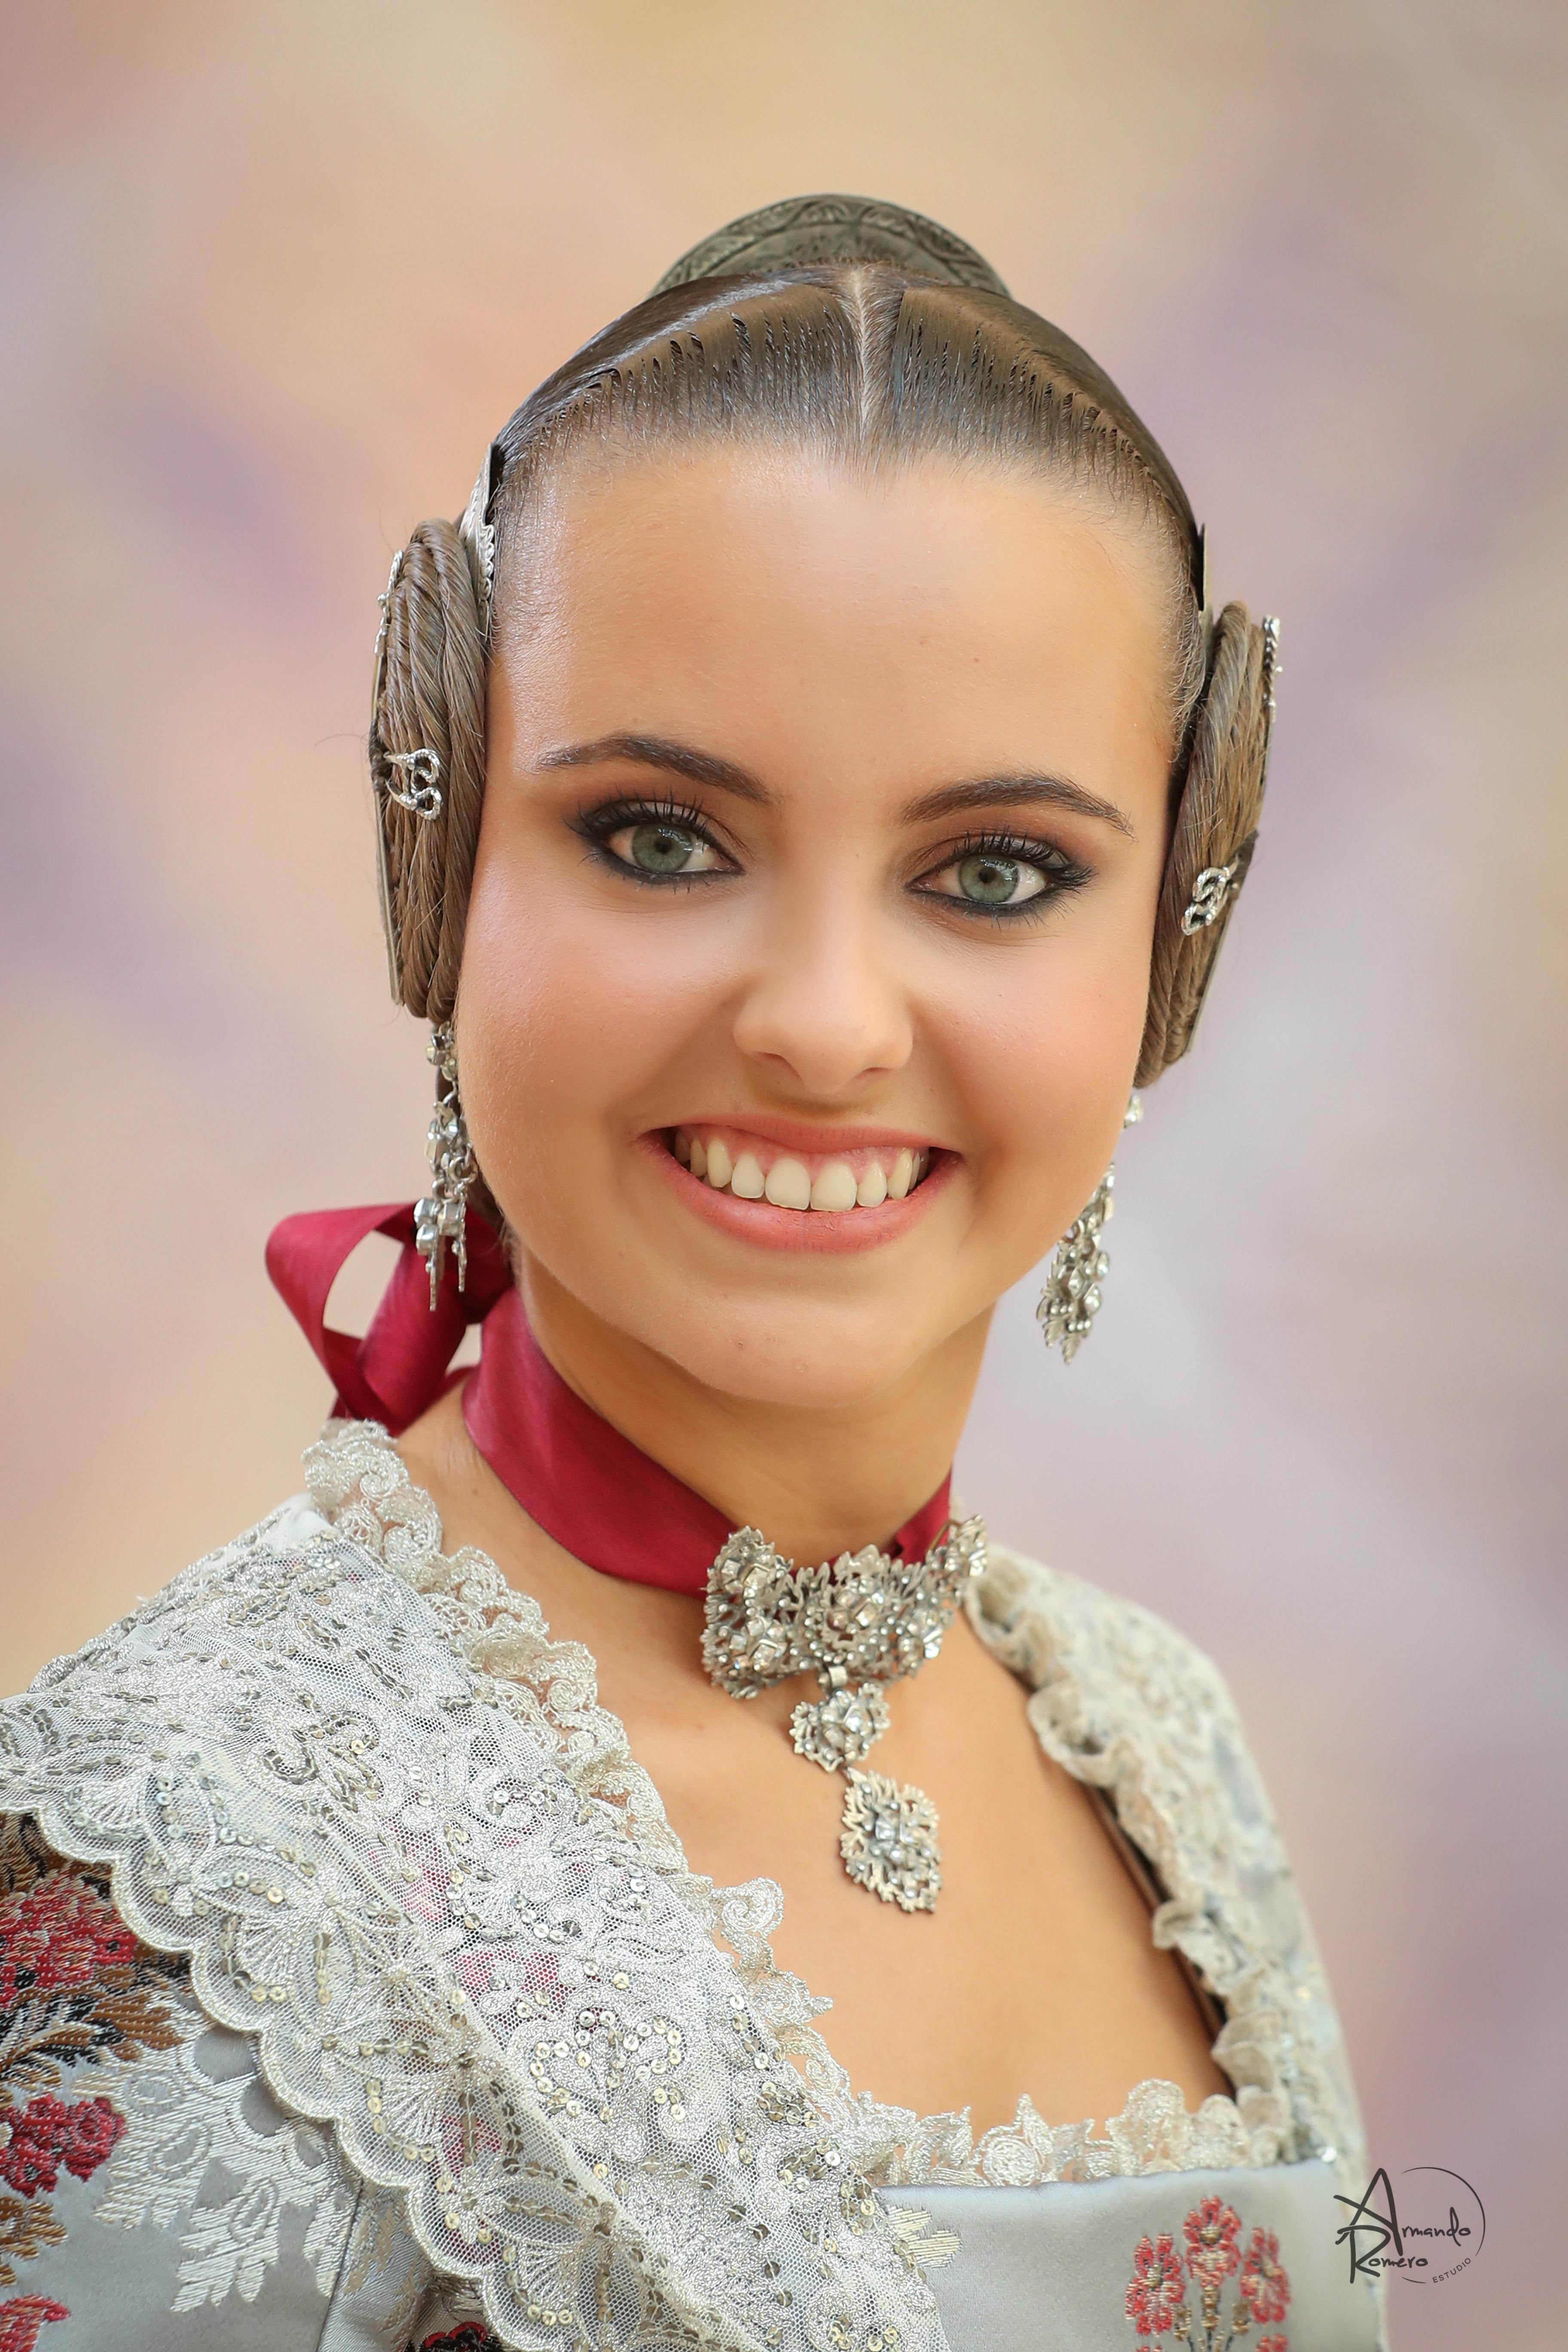 Anna Adela Dugann Capuz